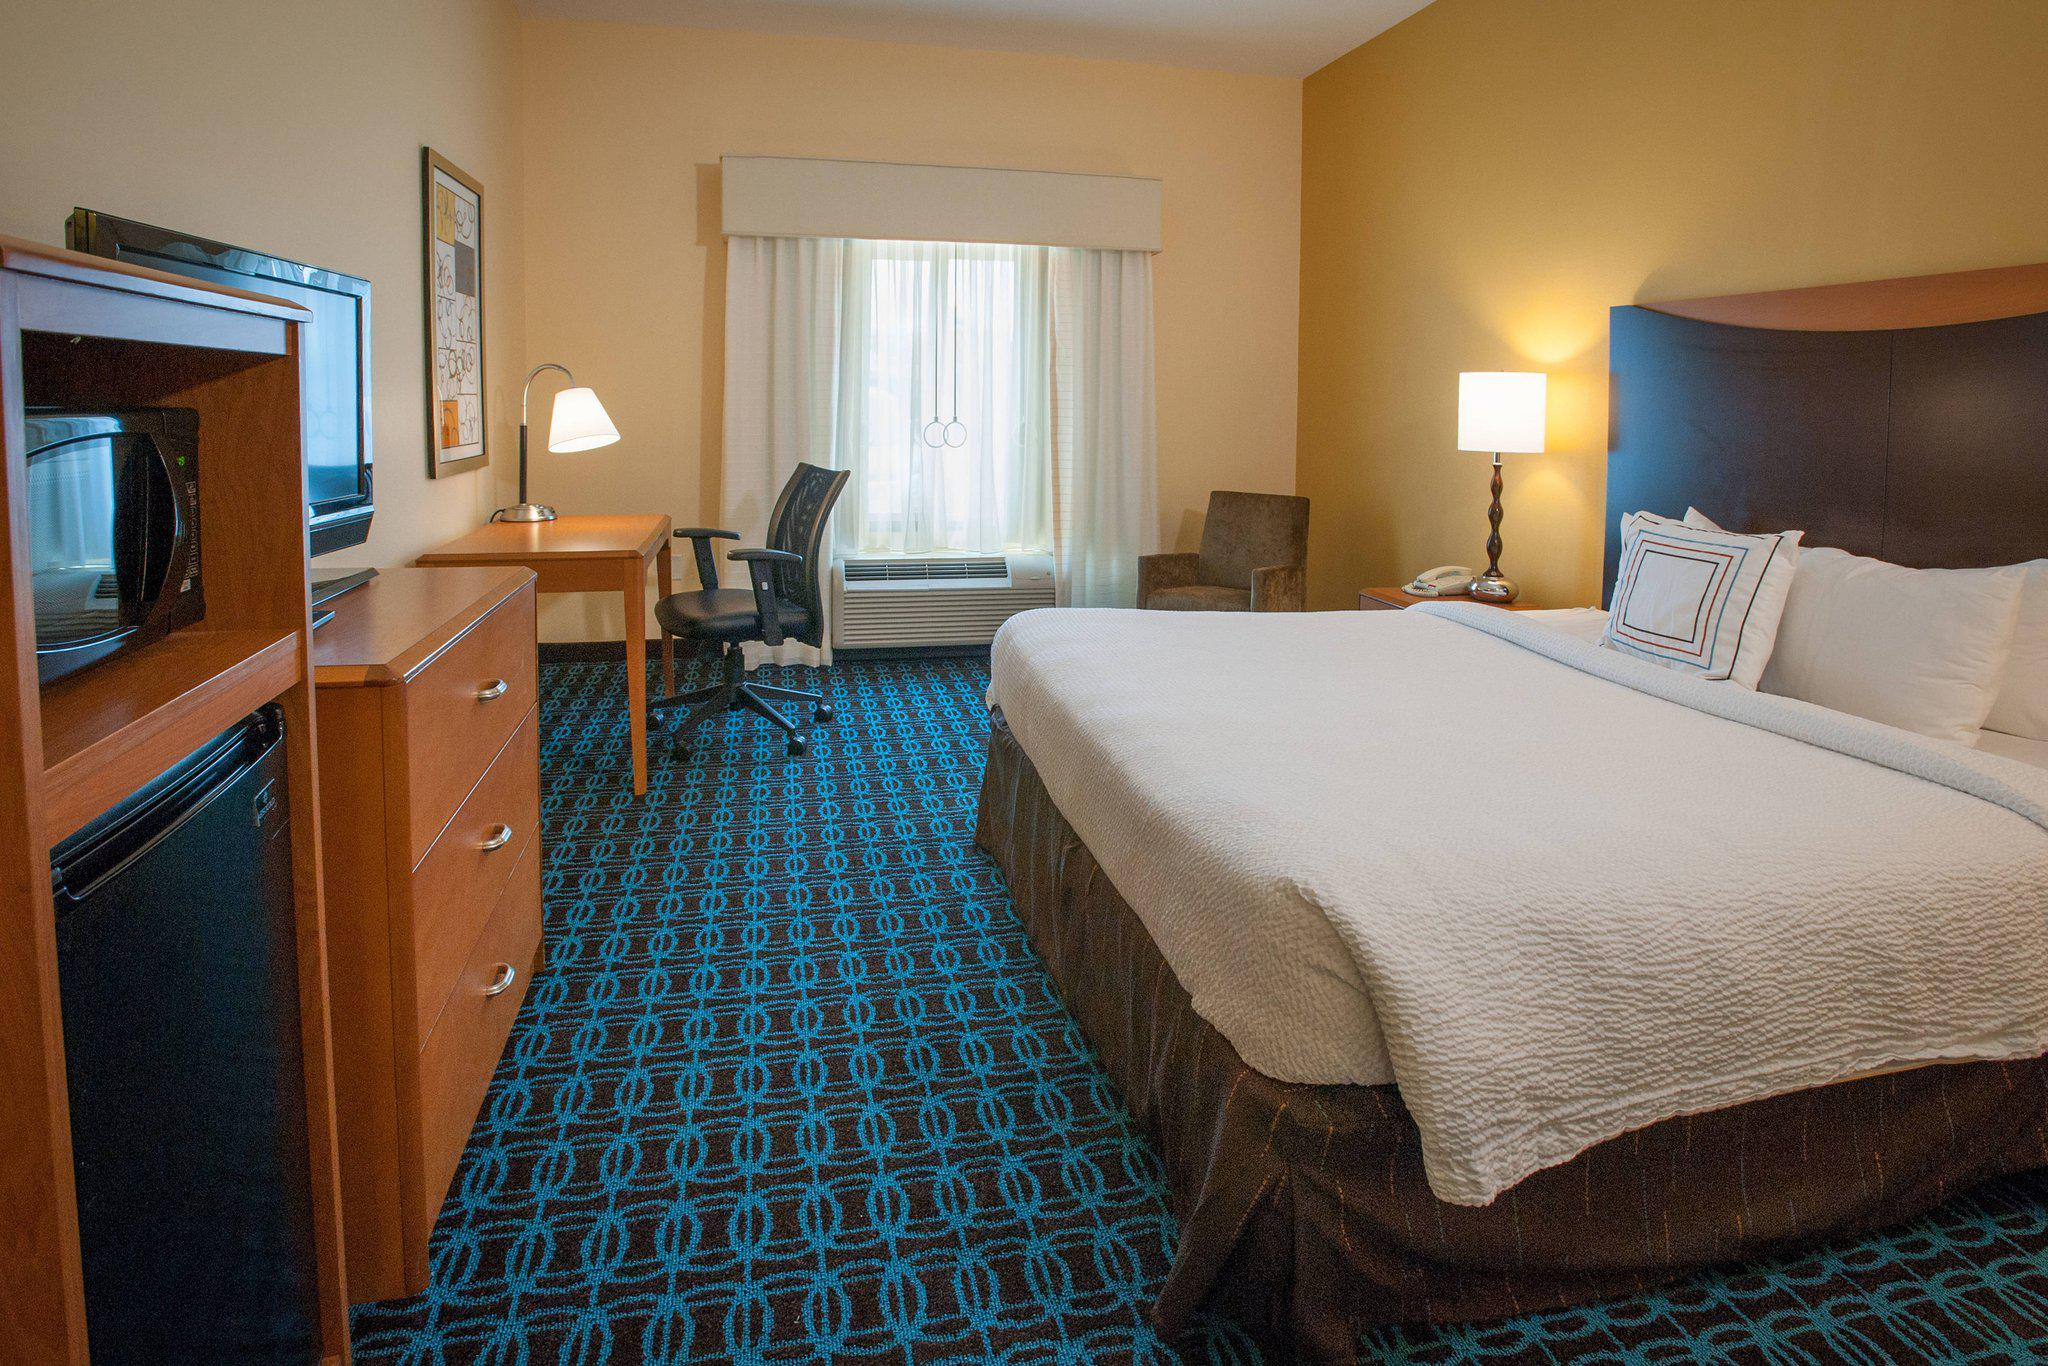 Fairfield Inn & Suites by Marriott Orange Beach